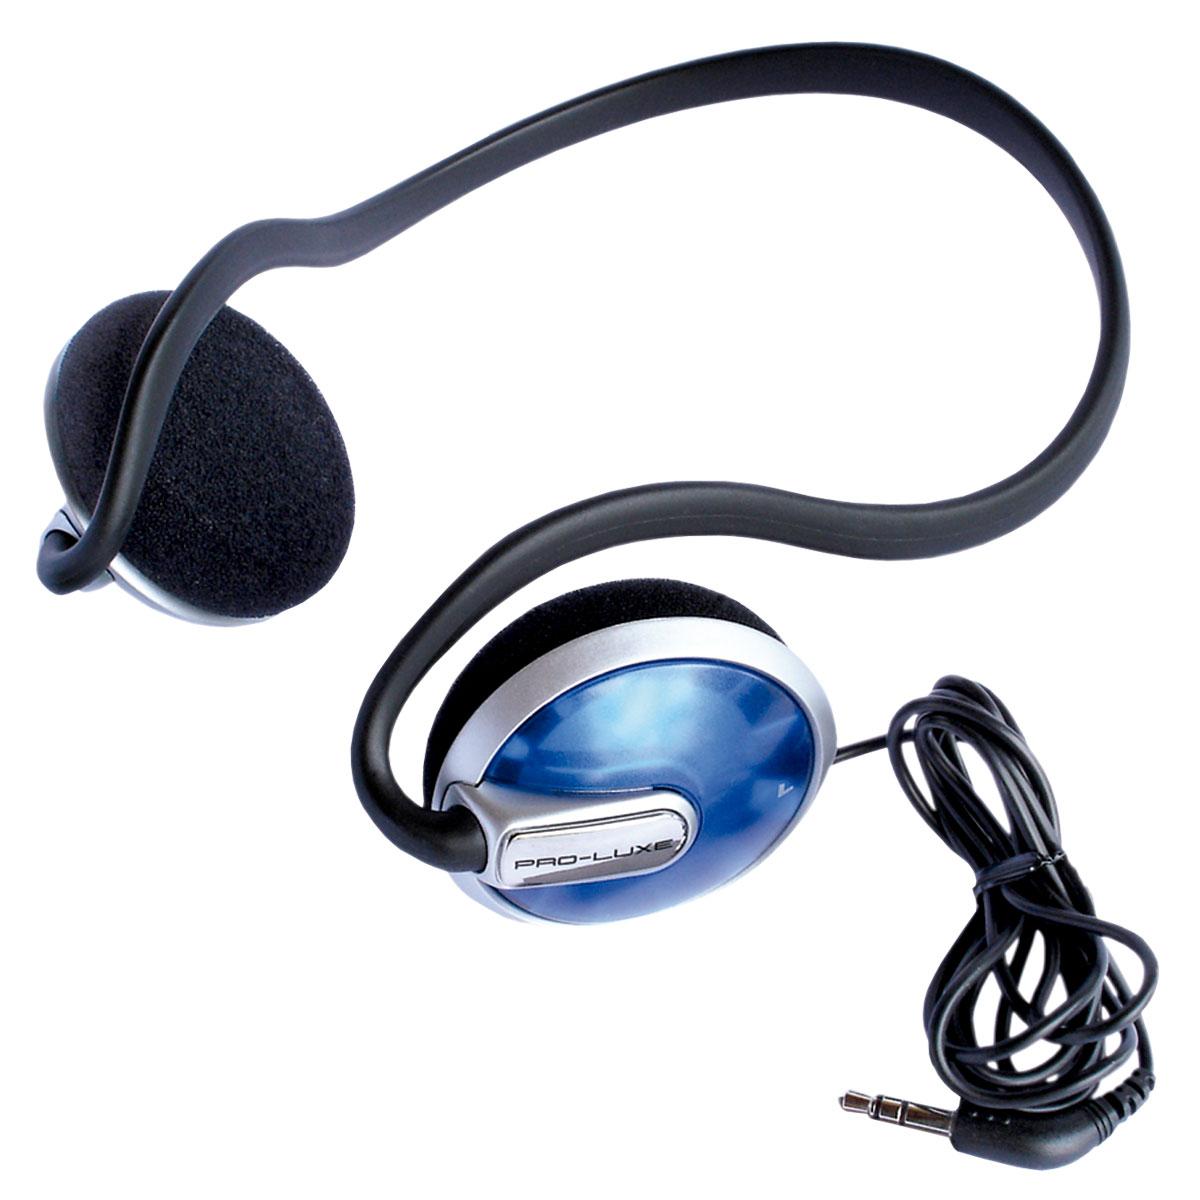 Fone de Ouvido Neckband 20 Hz - 20 KHz 32 Ohms - BP 35 Yoga